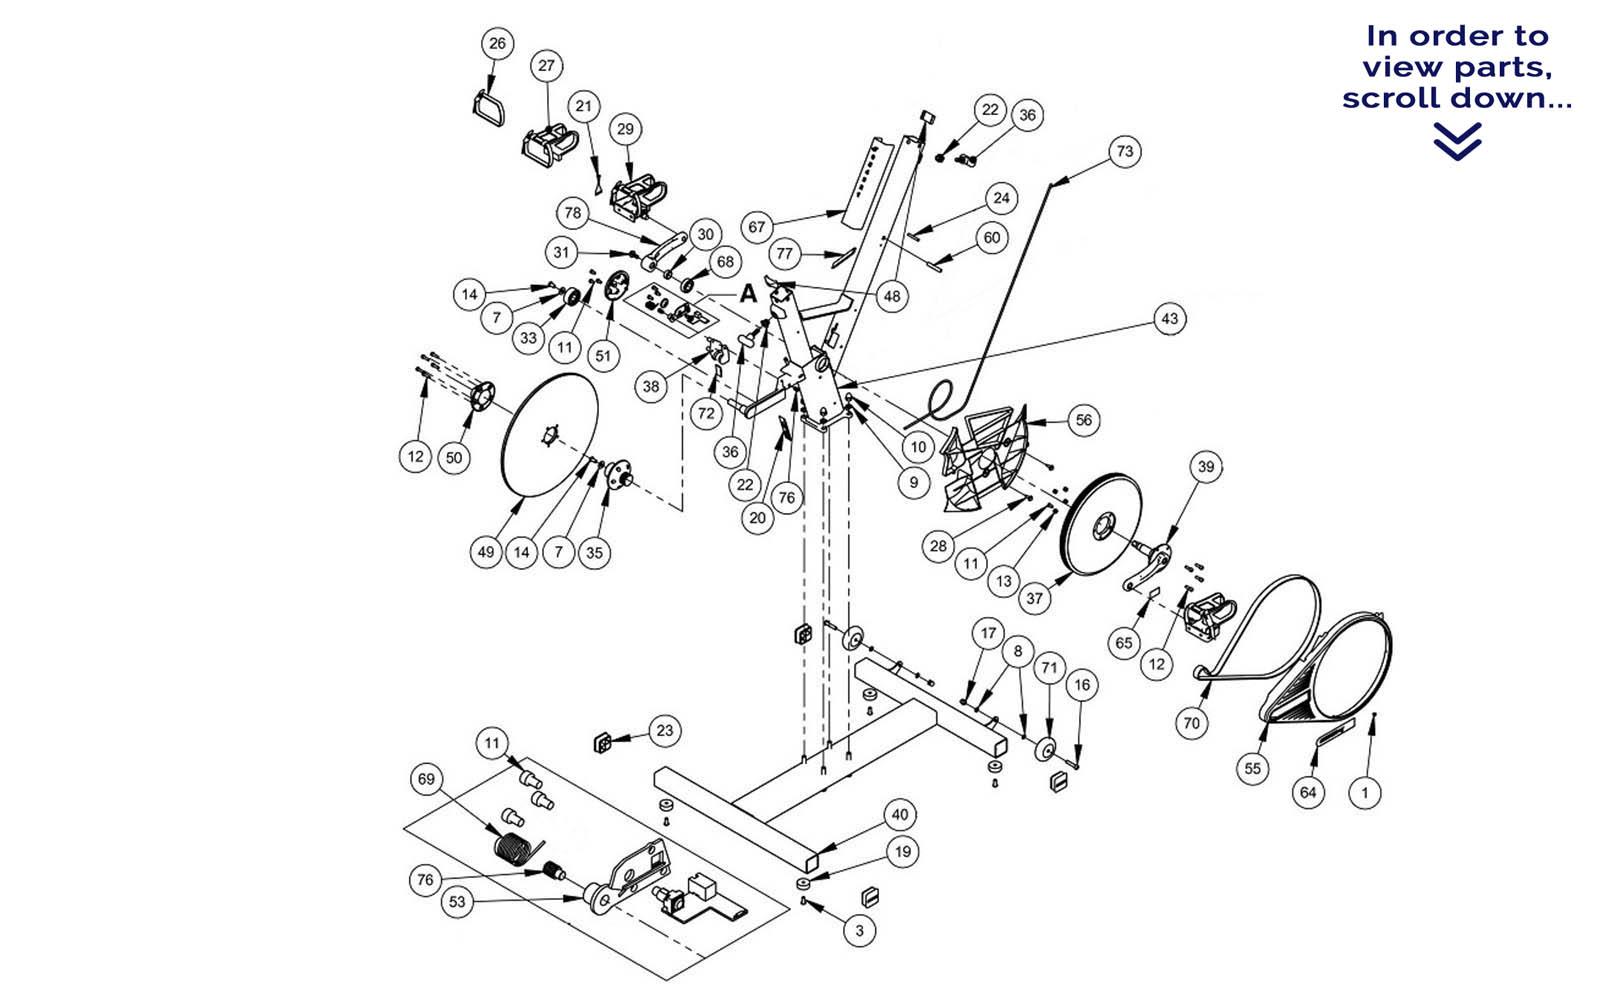 bike parts diagram led strobe circuit keiser m3 flywheel crank scroll down to view